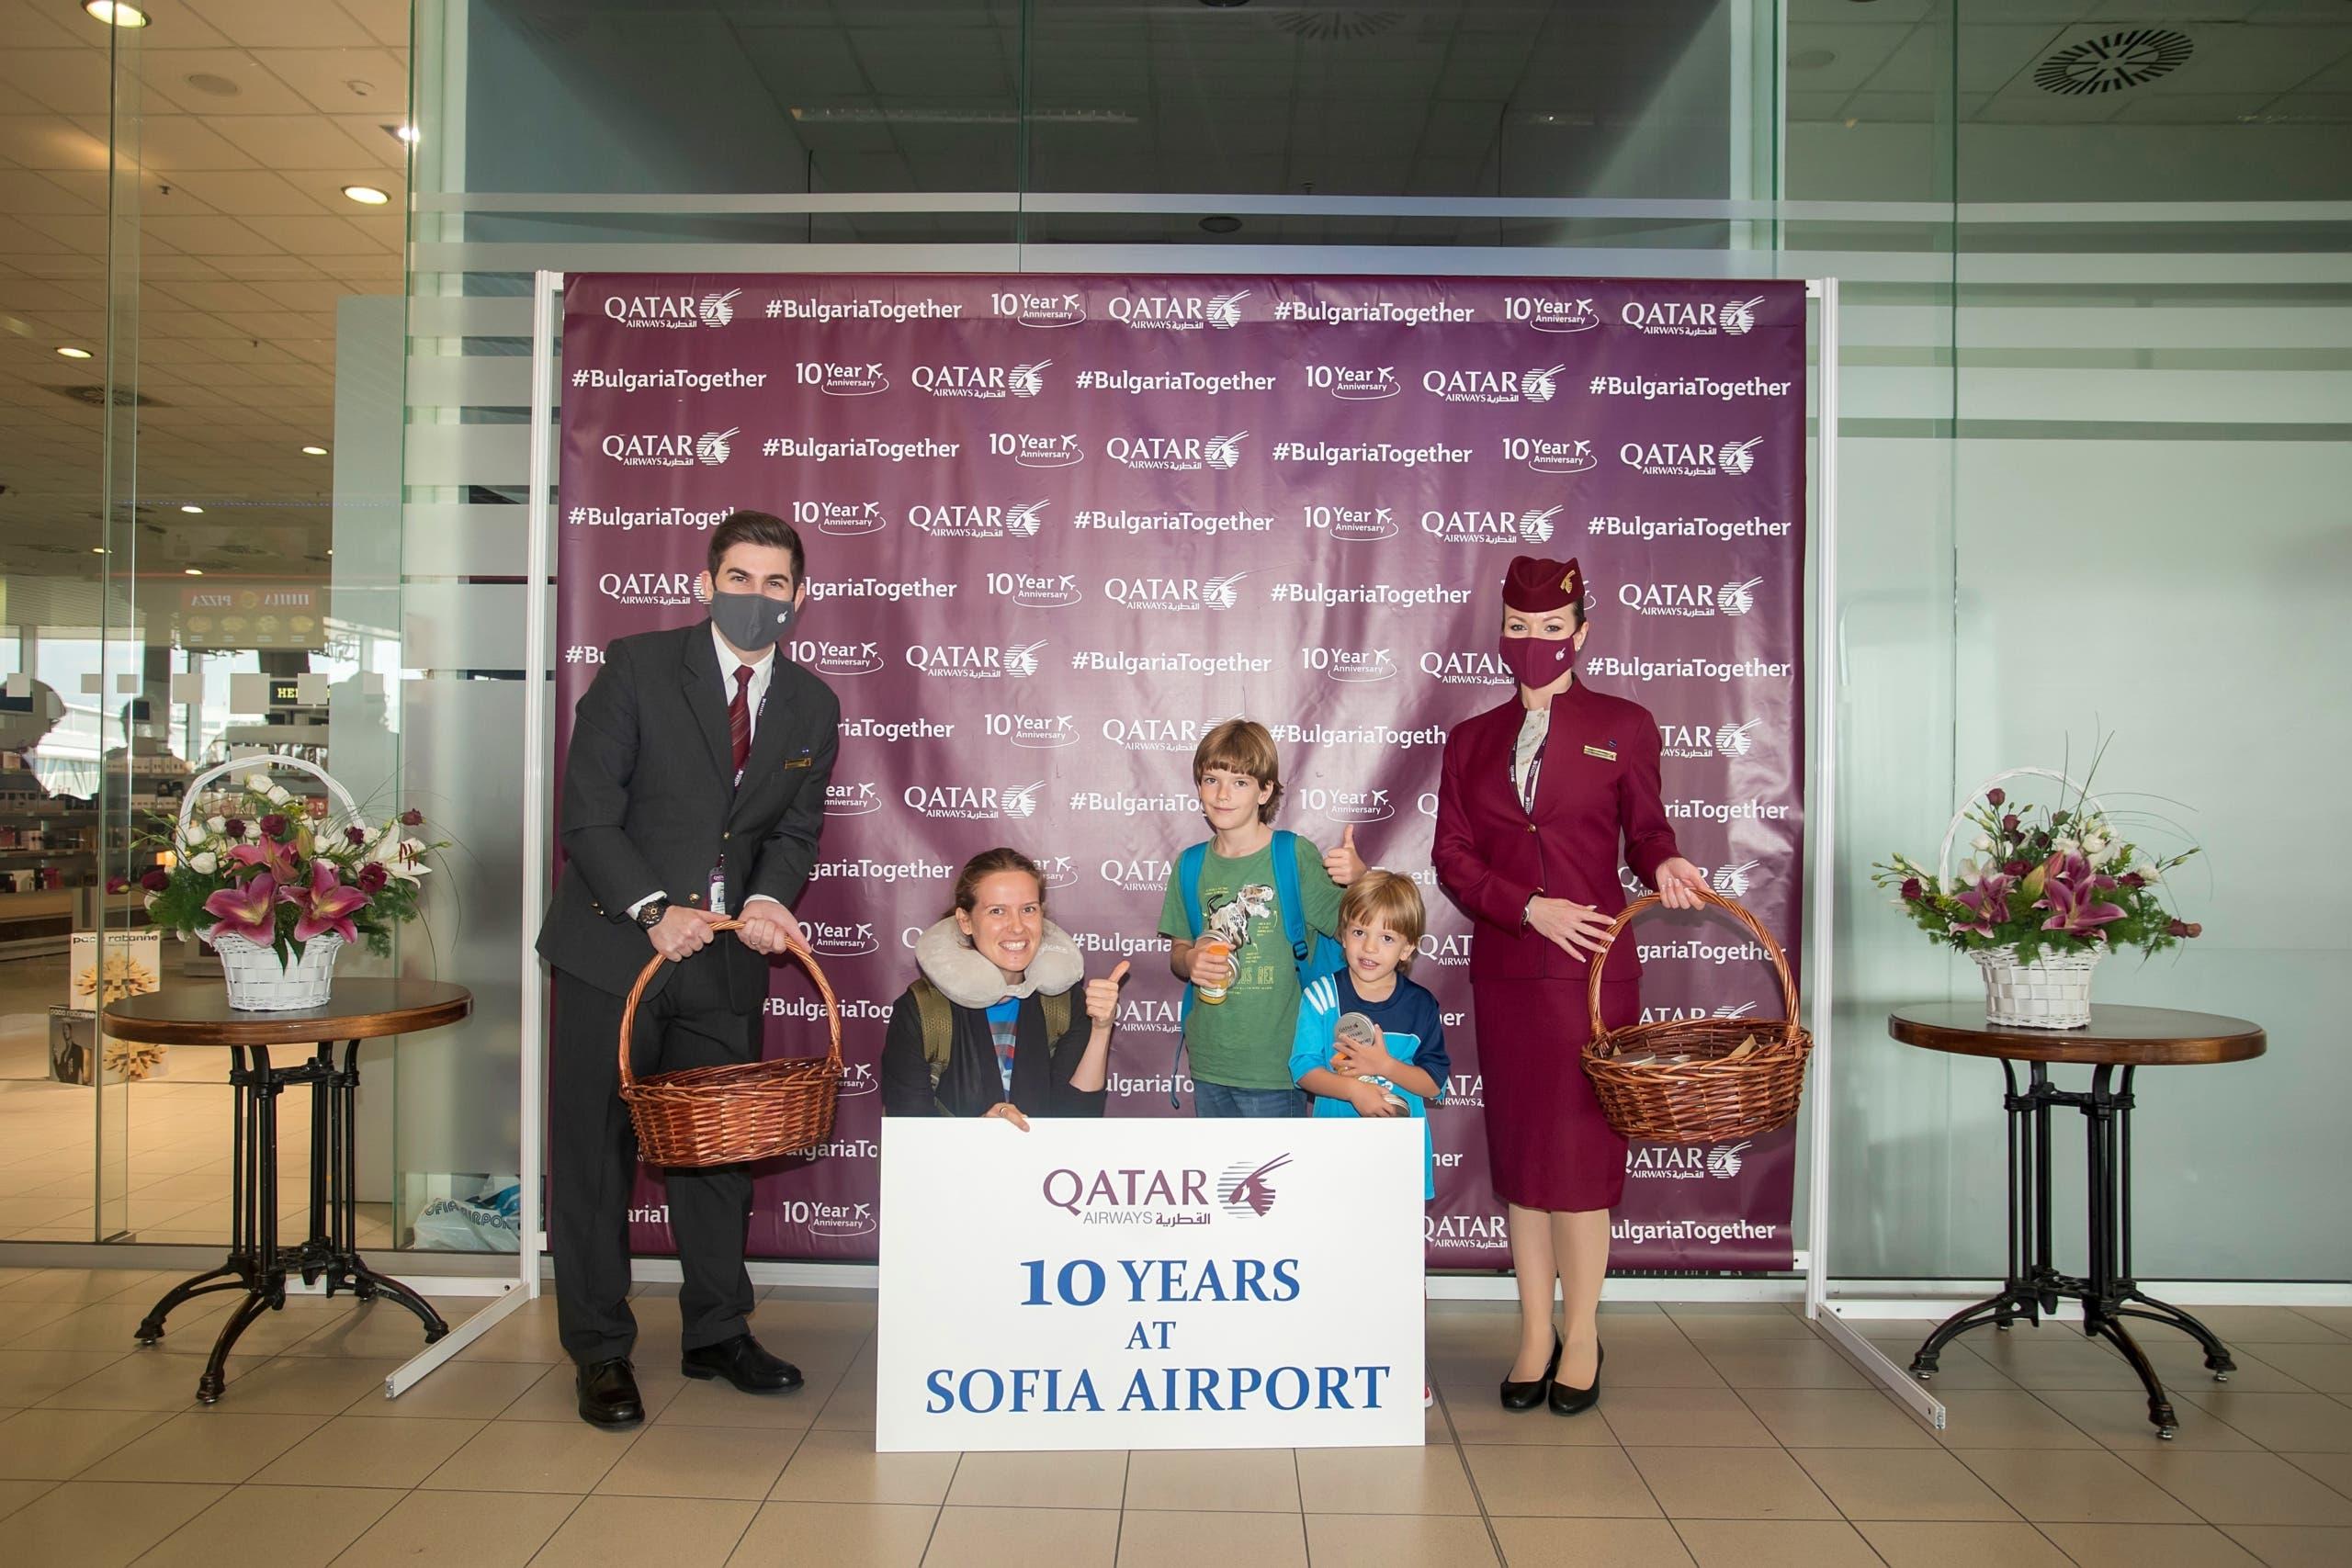 10 Years Strong: Qatar Airways Celebrates Its Sofia Aniversary